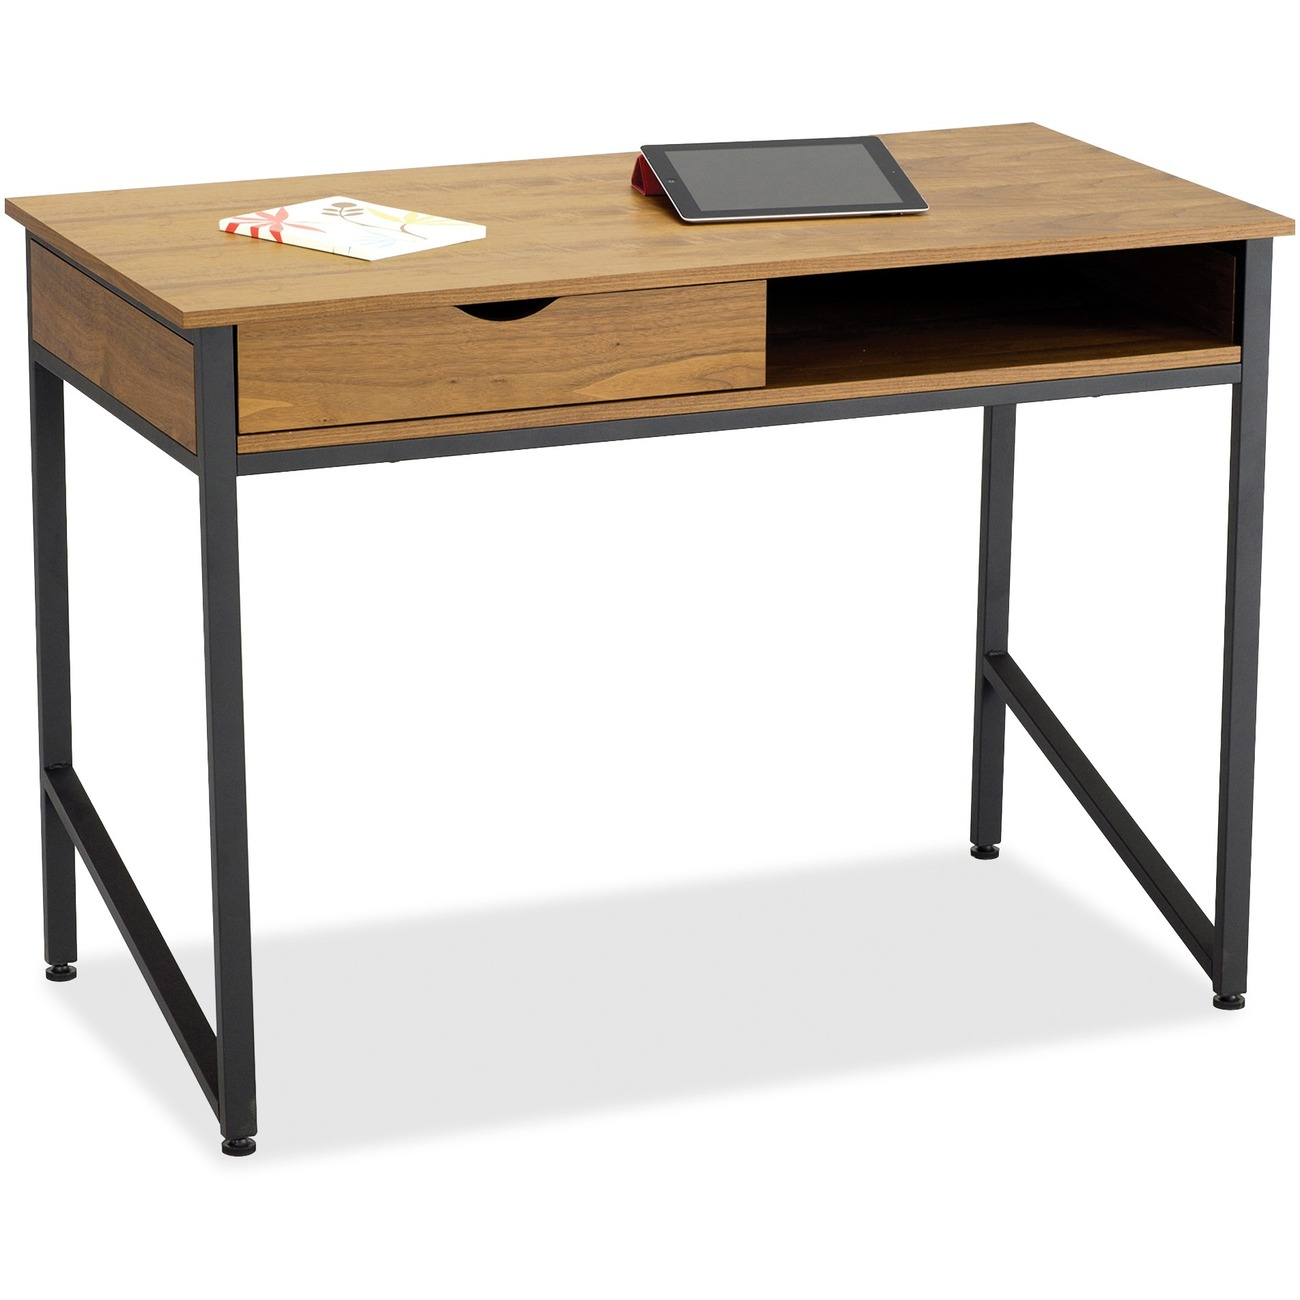 design furniture delle products table the office wooden studio ot kids wood alpi